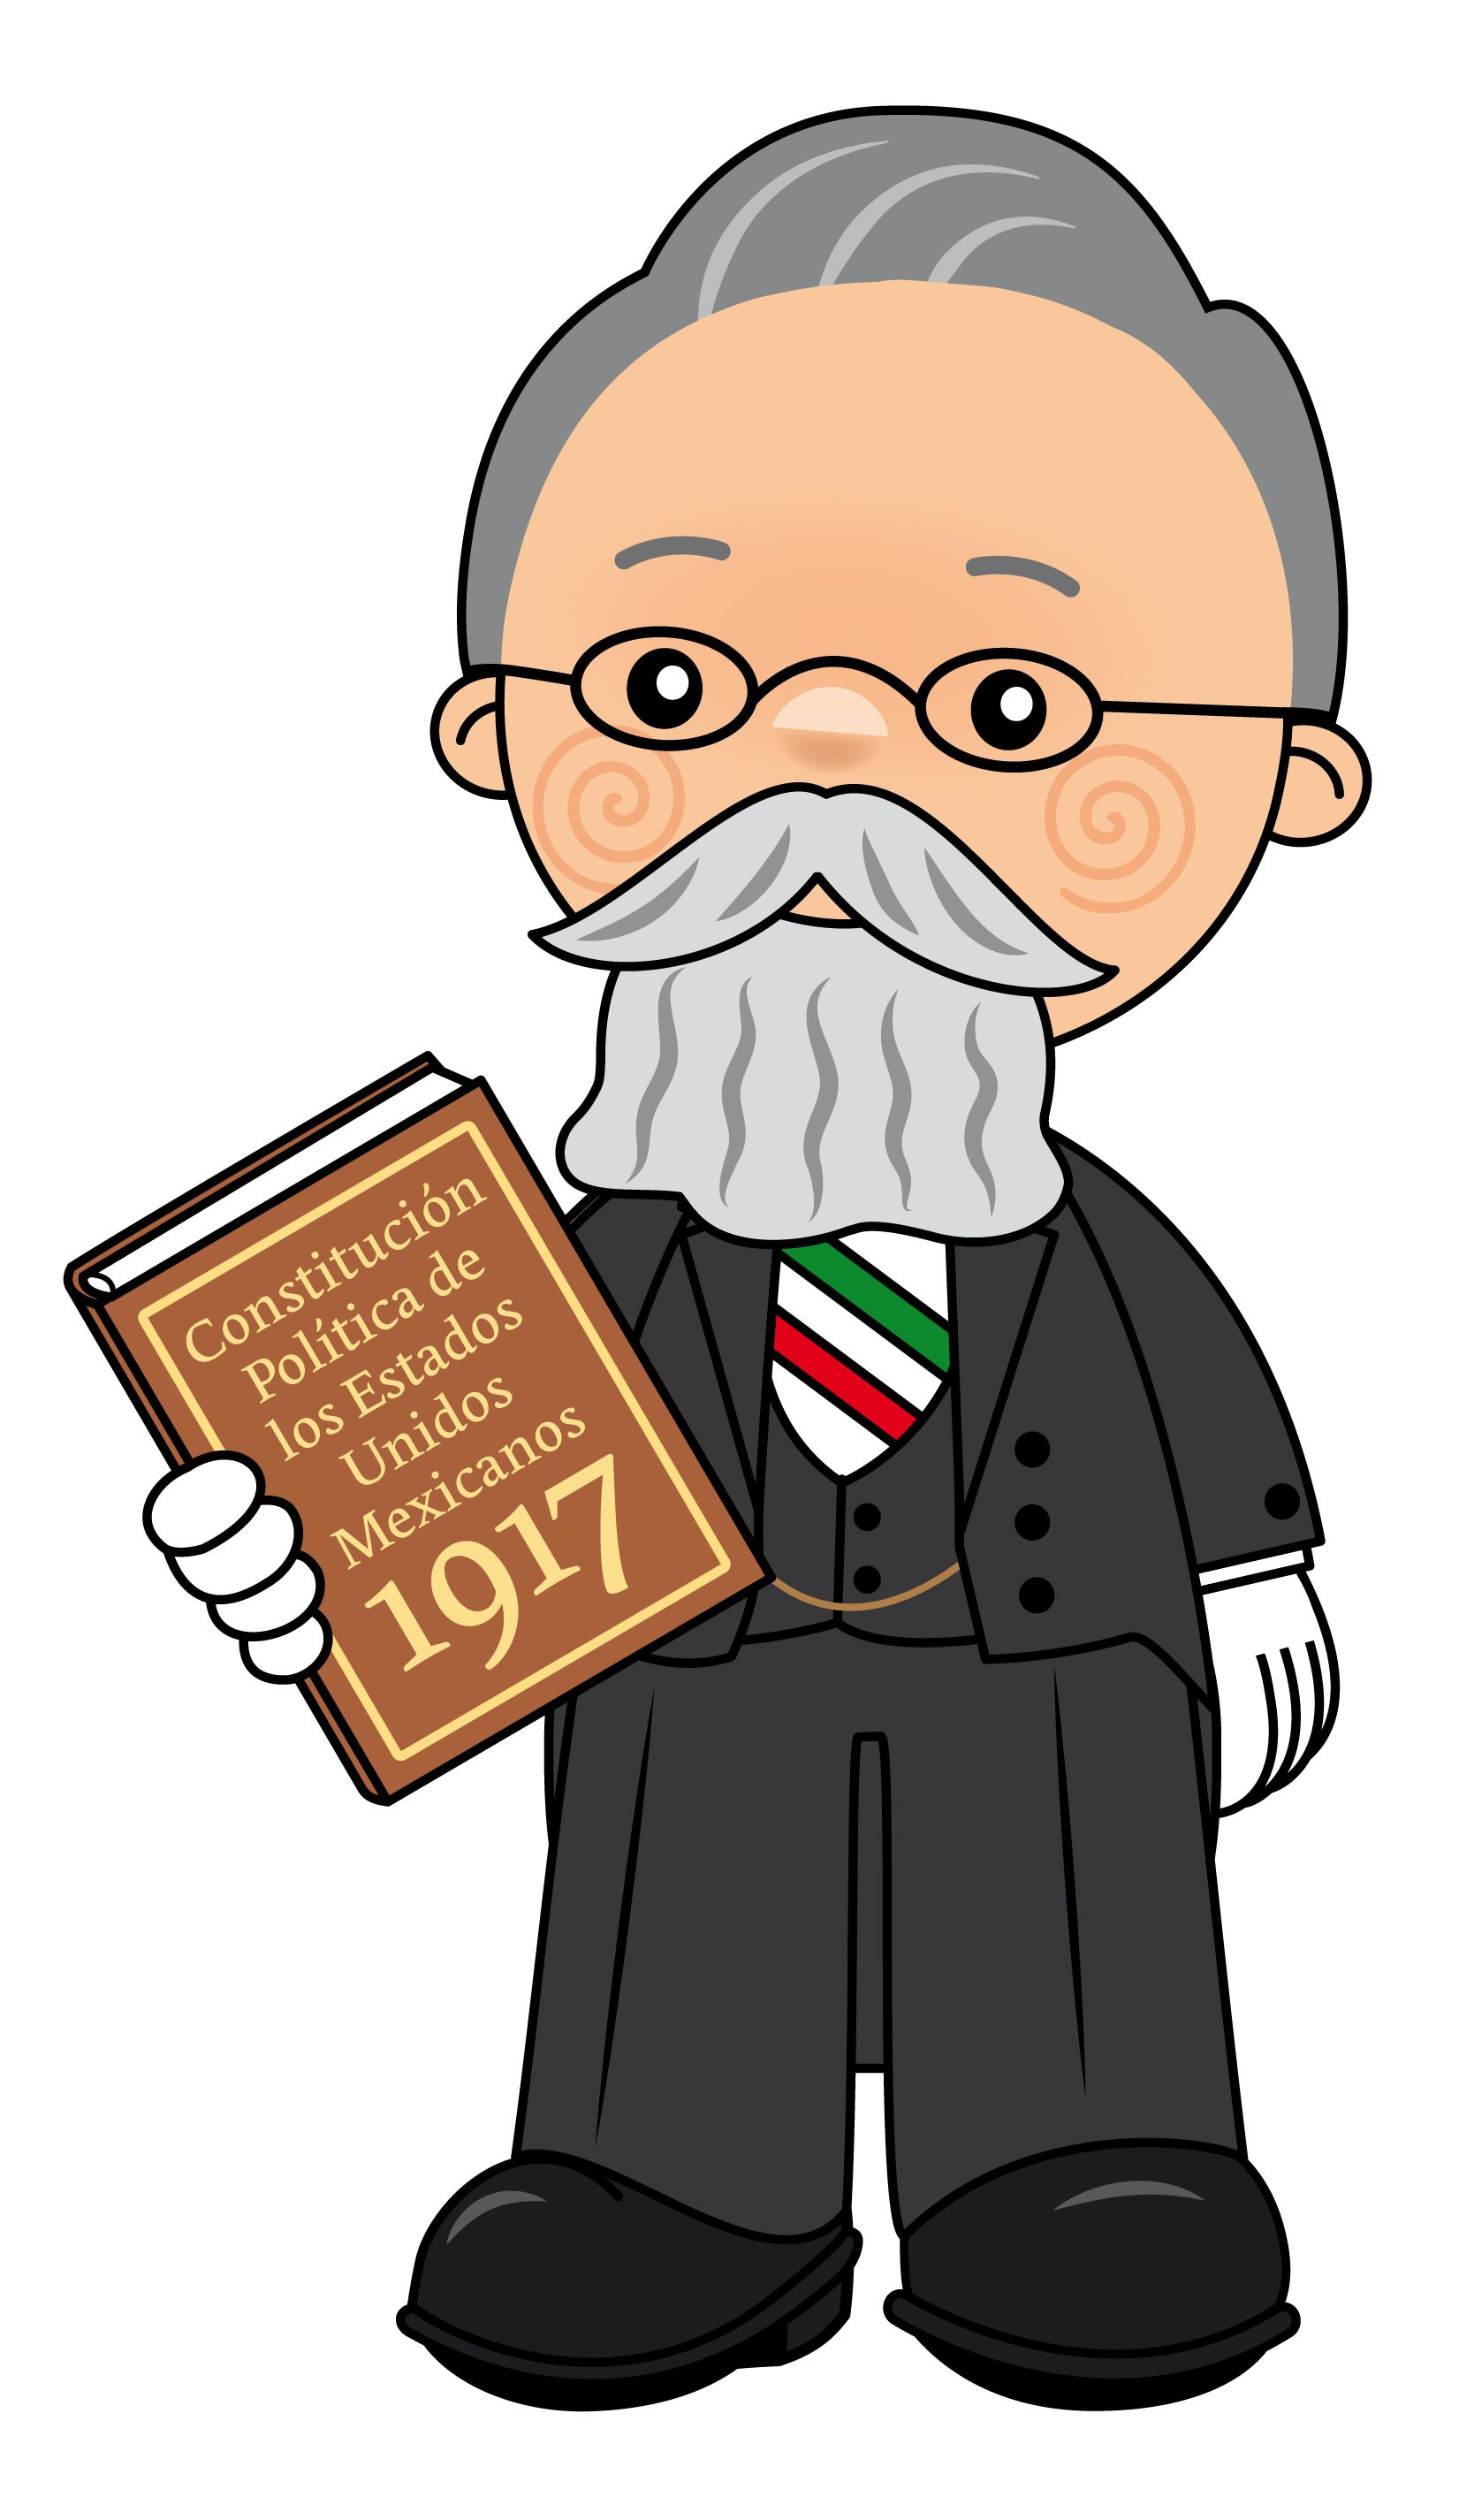 Venustiano Carranza 2 Revolucion Mexicana Para Ninos Constitucion Mexicana Para Ninos Revolucion Mexicana Para Colorear